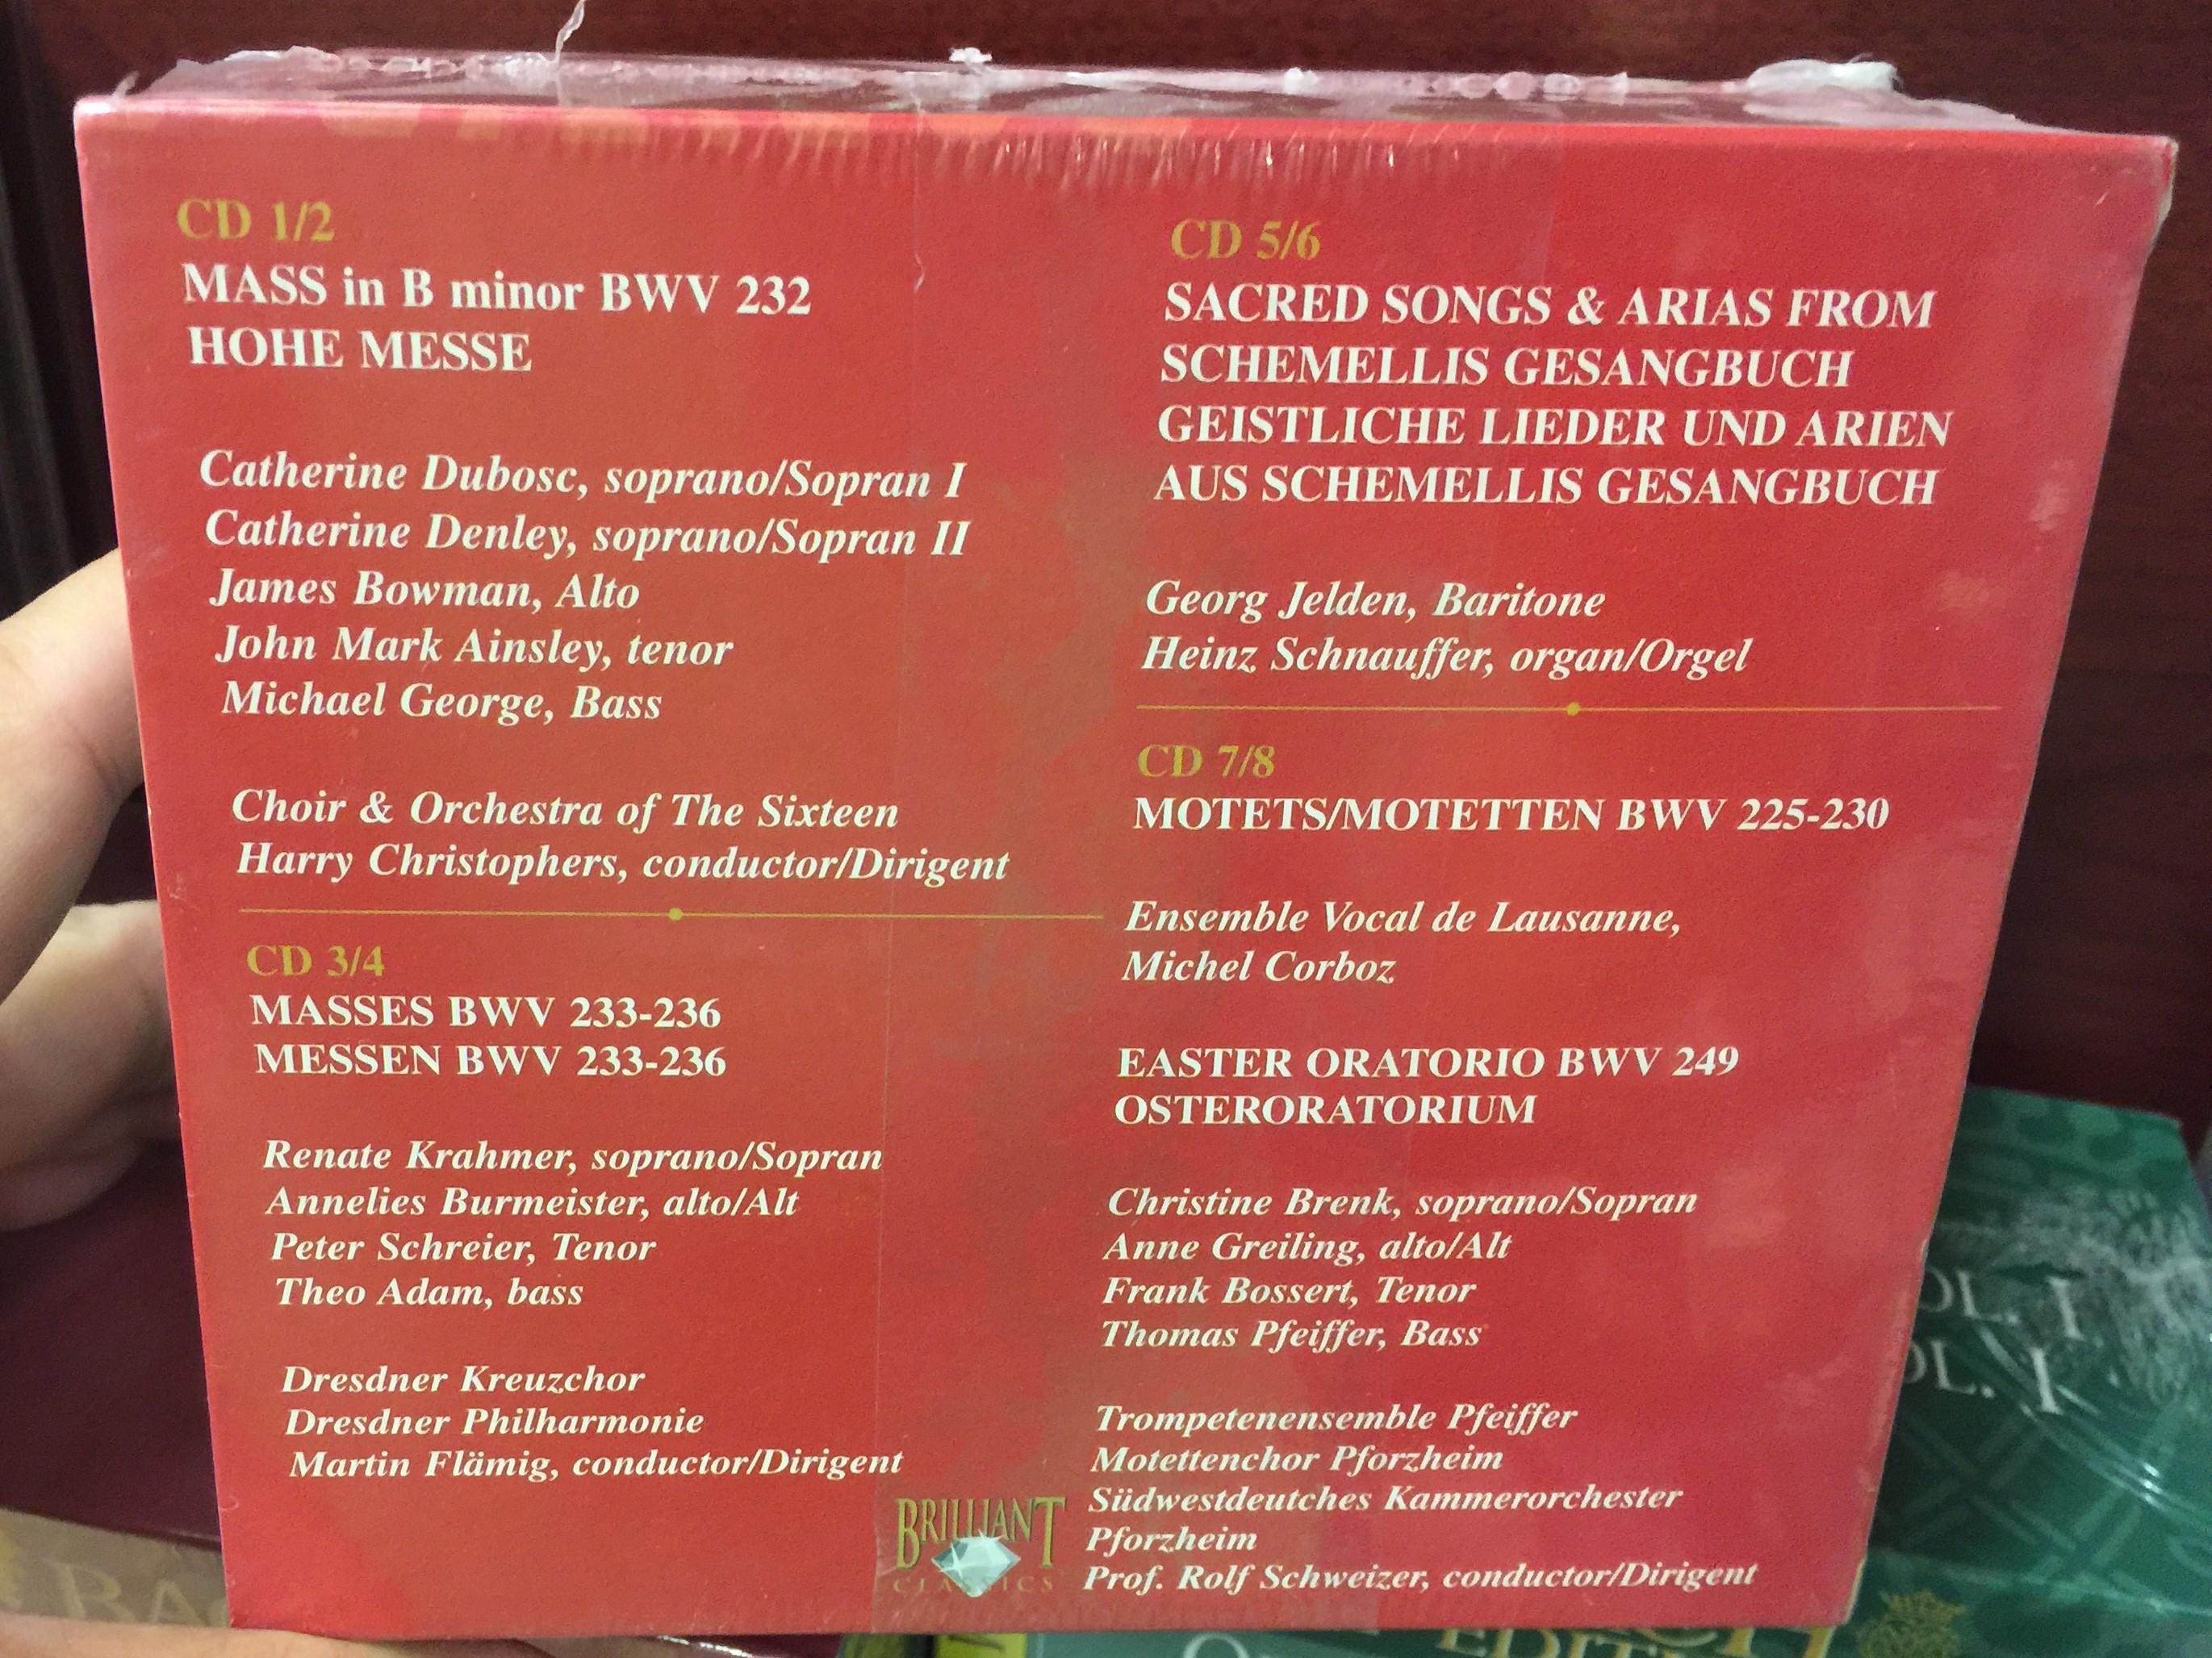 bach-edition-vocal-works-vol.-i-vokalwerke-volume-2-brilliant-classics-8x-audio-cd-box-set-99361-3-.jpg